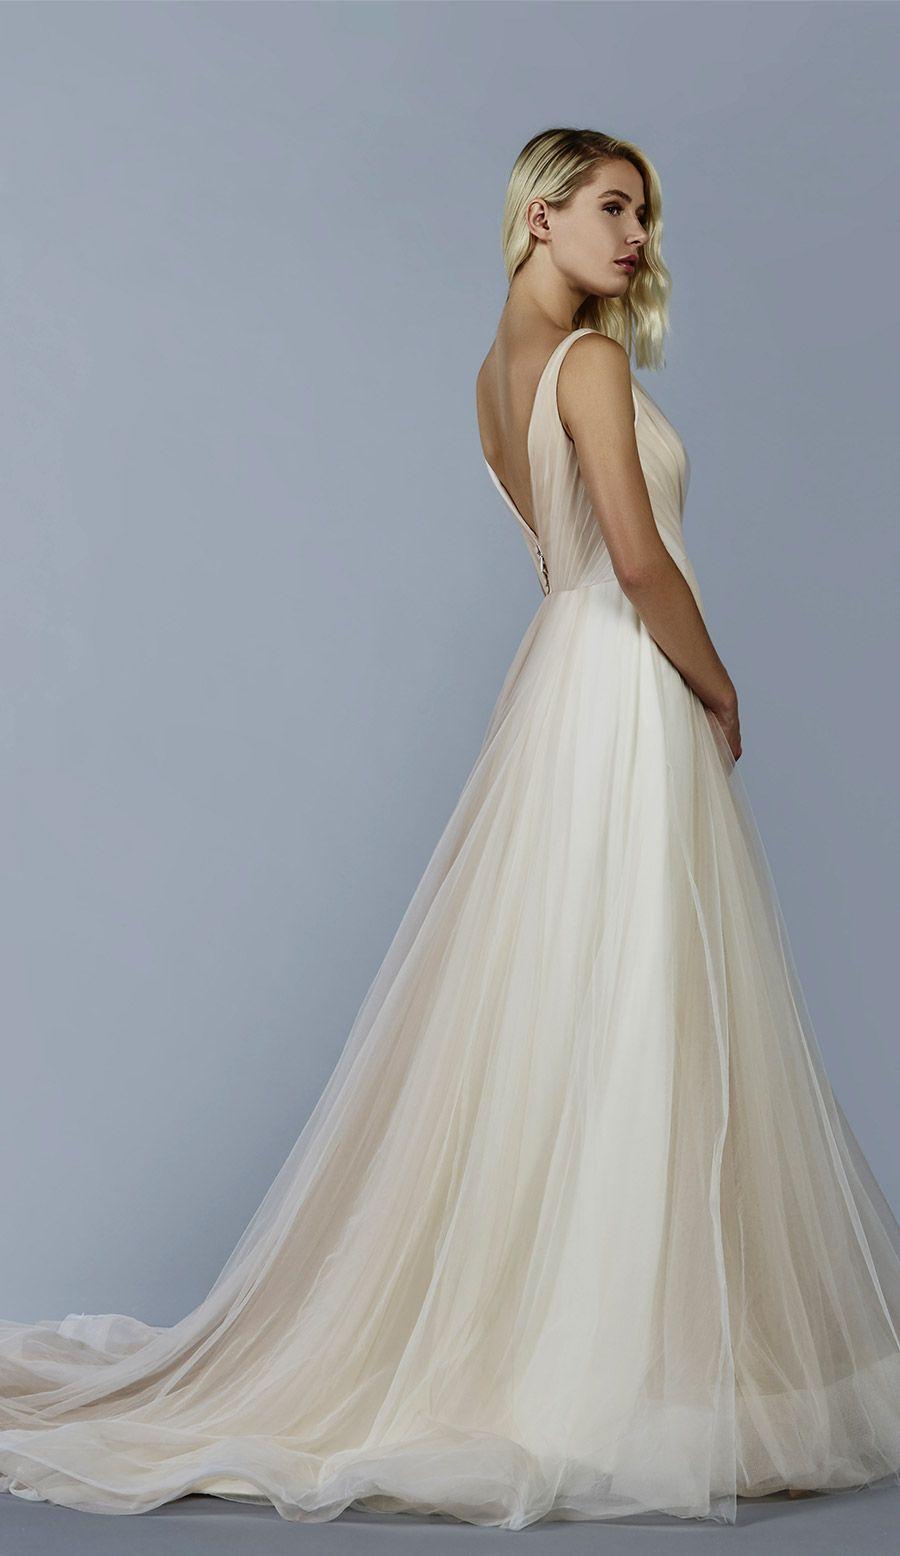 Excellent Vestido Novia Grace Kelly Photos - Wedding Ideas ...